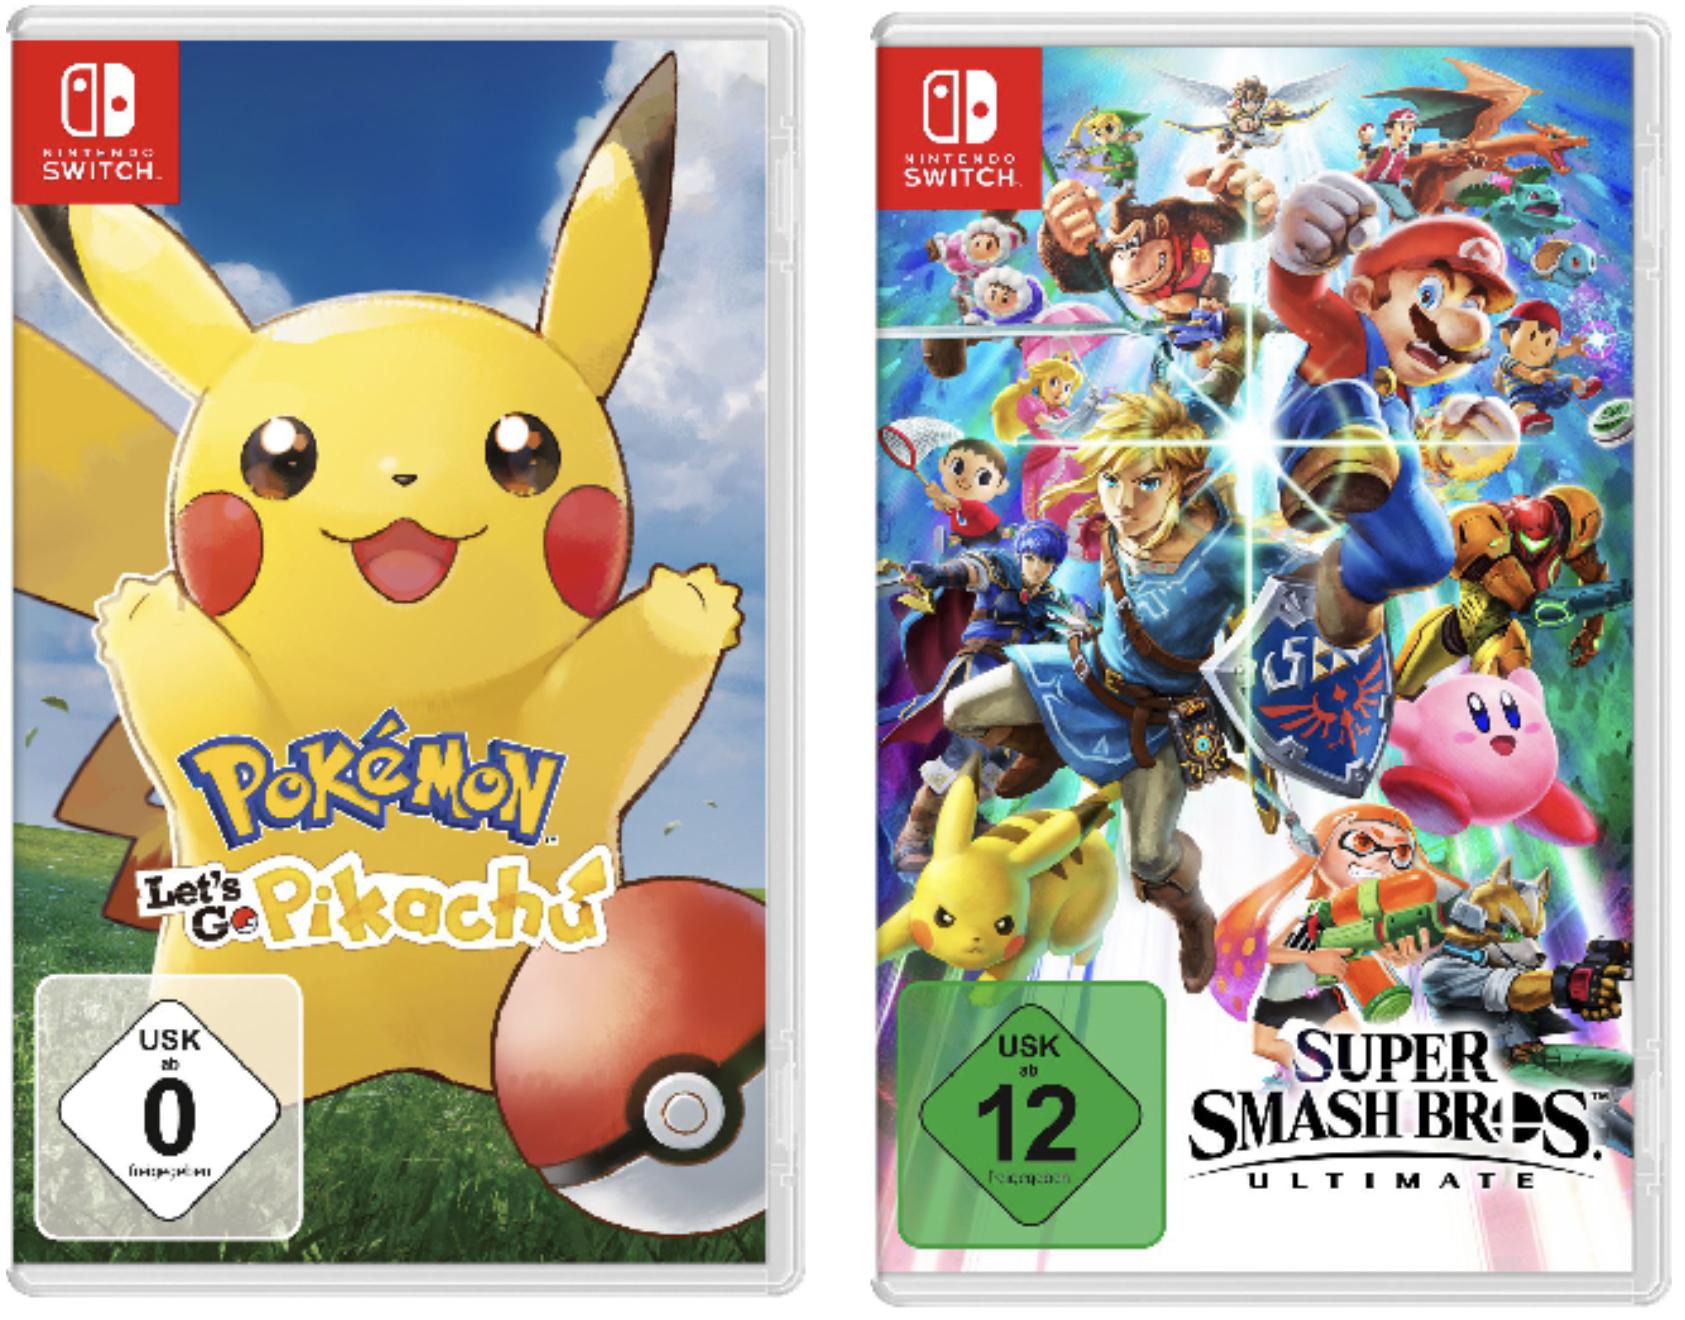 Nintendo Switch Pokémon Let's Go 34,79€ -  Super Smash Bros. Ultimate 49,99€ - Joy Con 2er 57,99€ und diverse mehr - m. Paydirekt